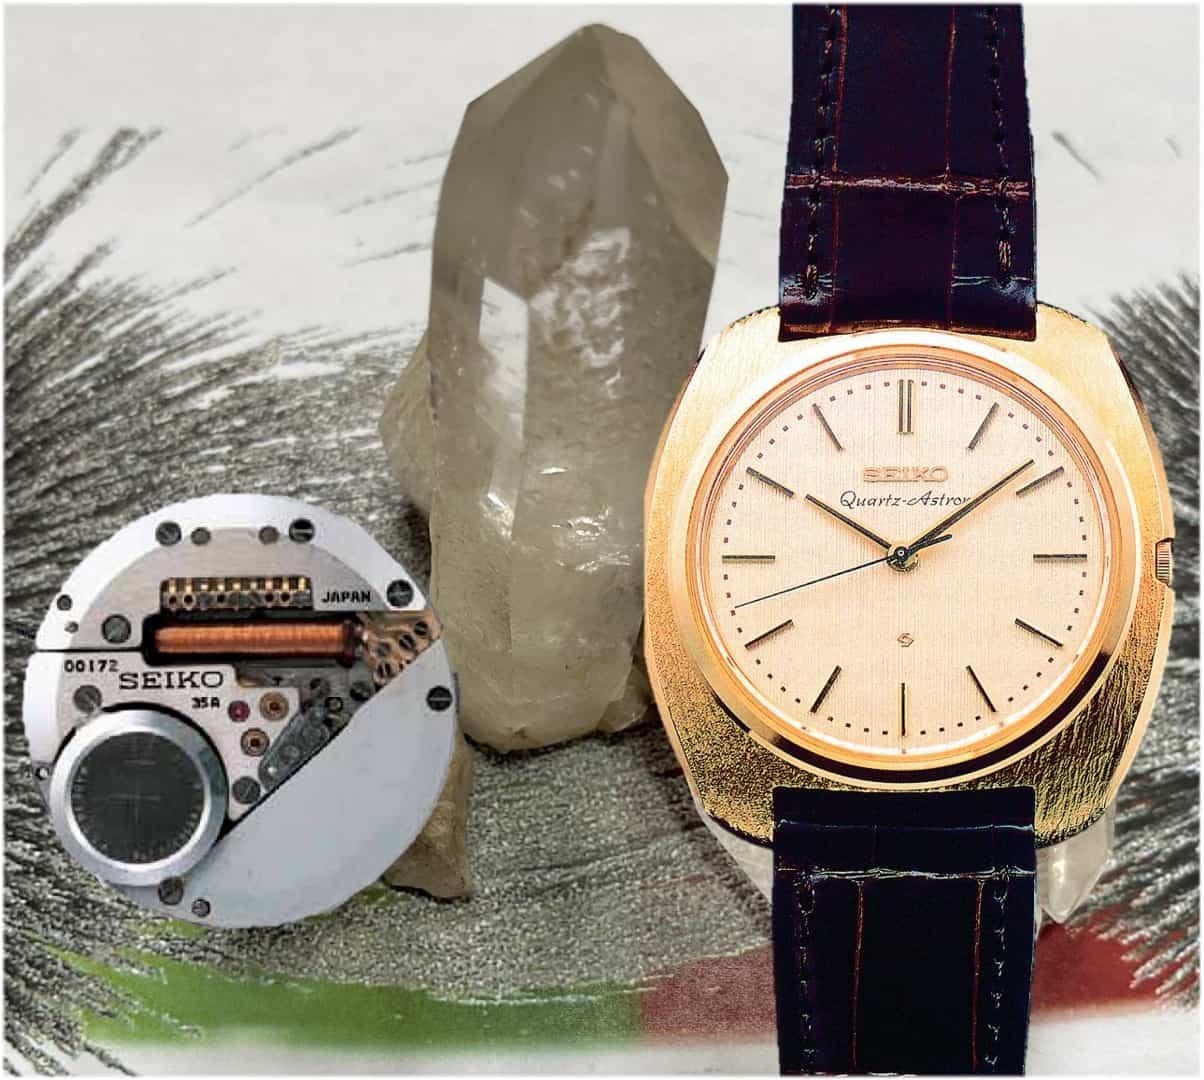 Seiko Astron Quartz Uhr aus dem Jahr 1969 mit dem kompakten Quarzuhrenkaliber